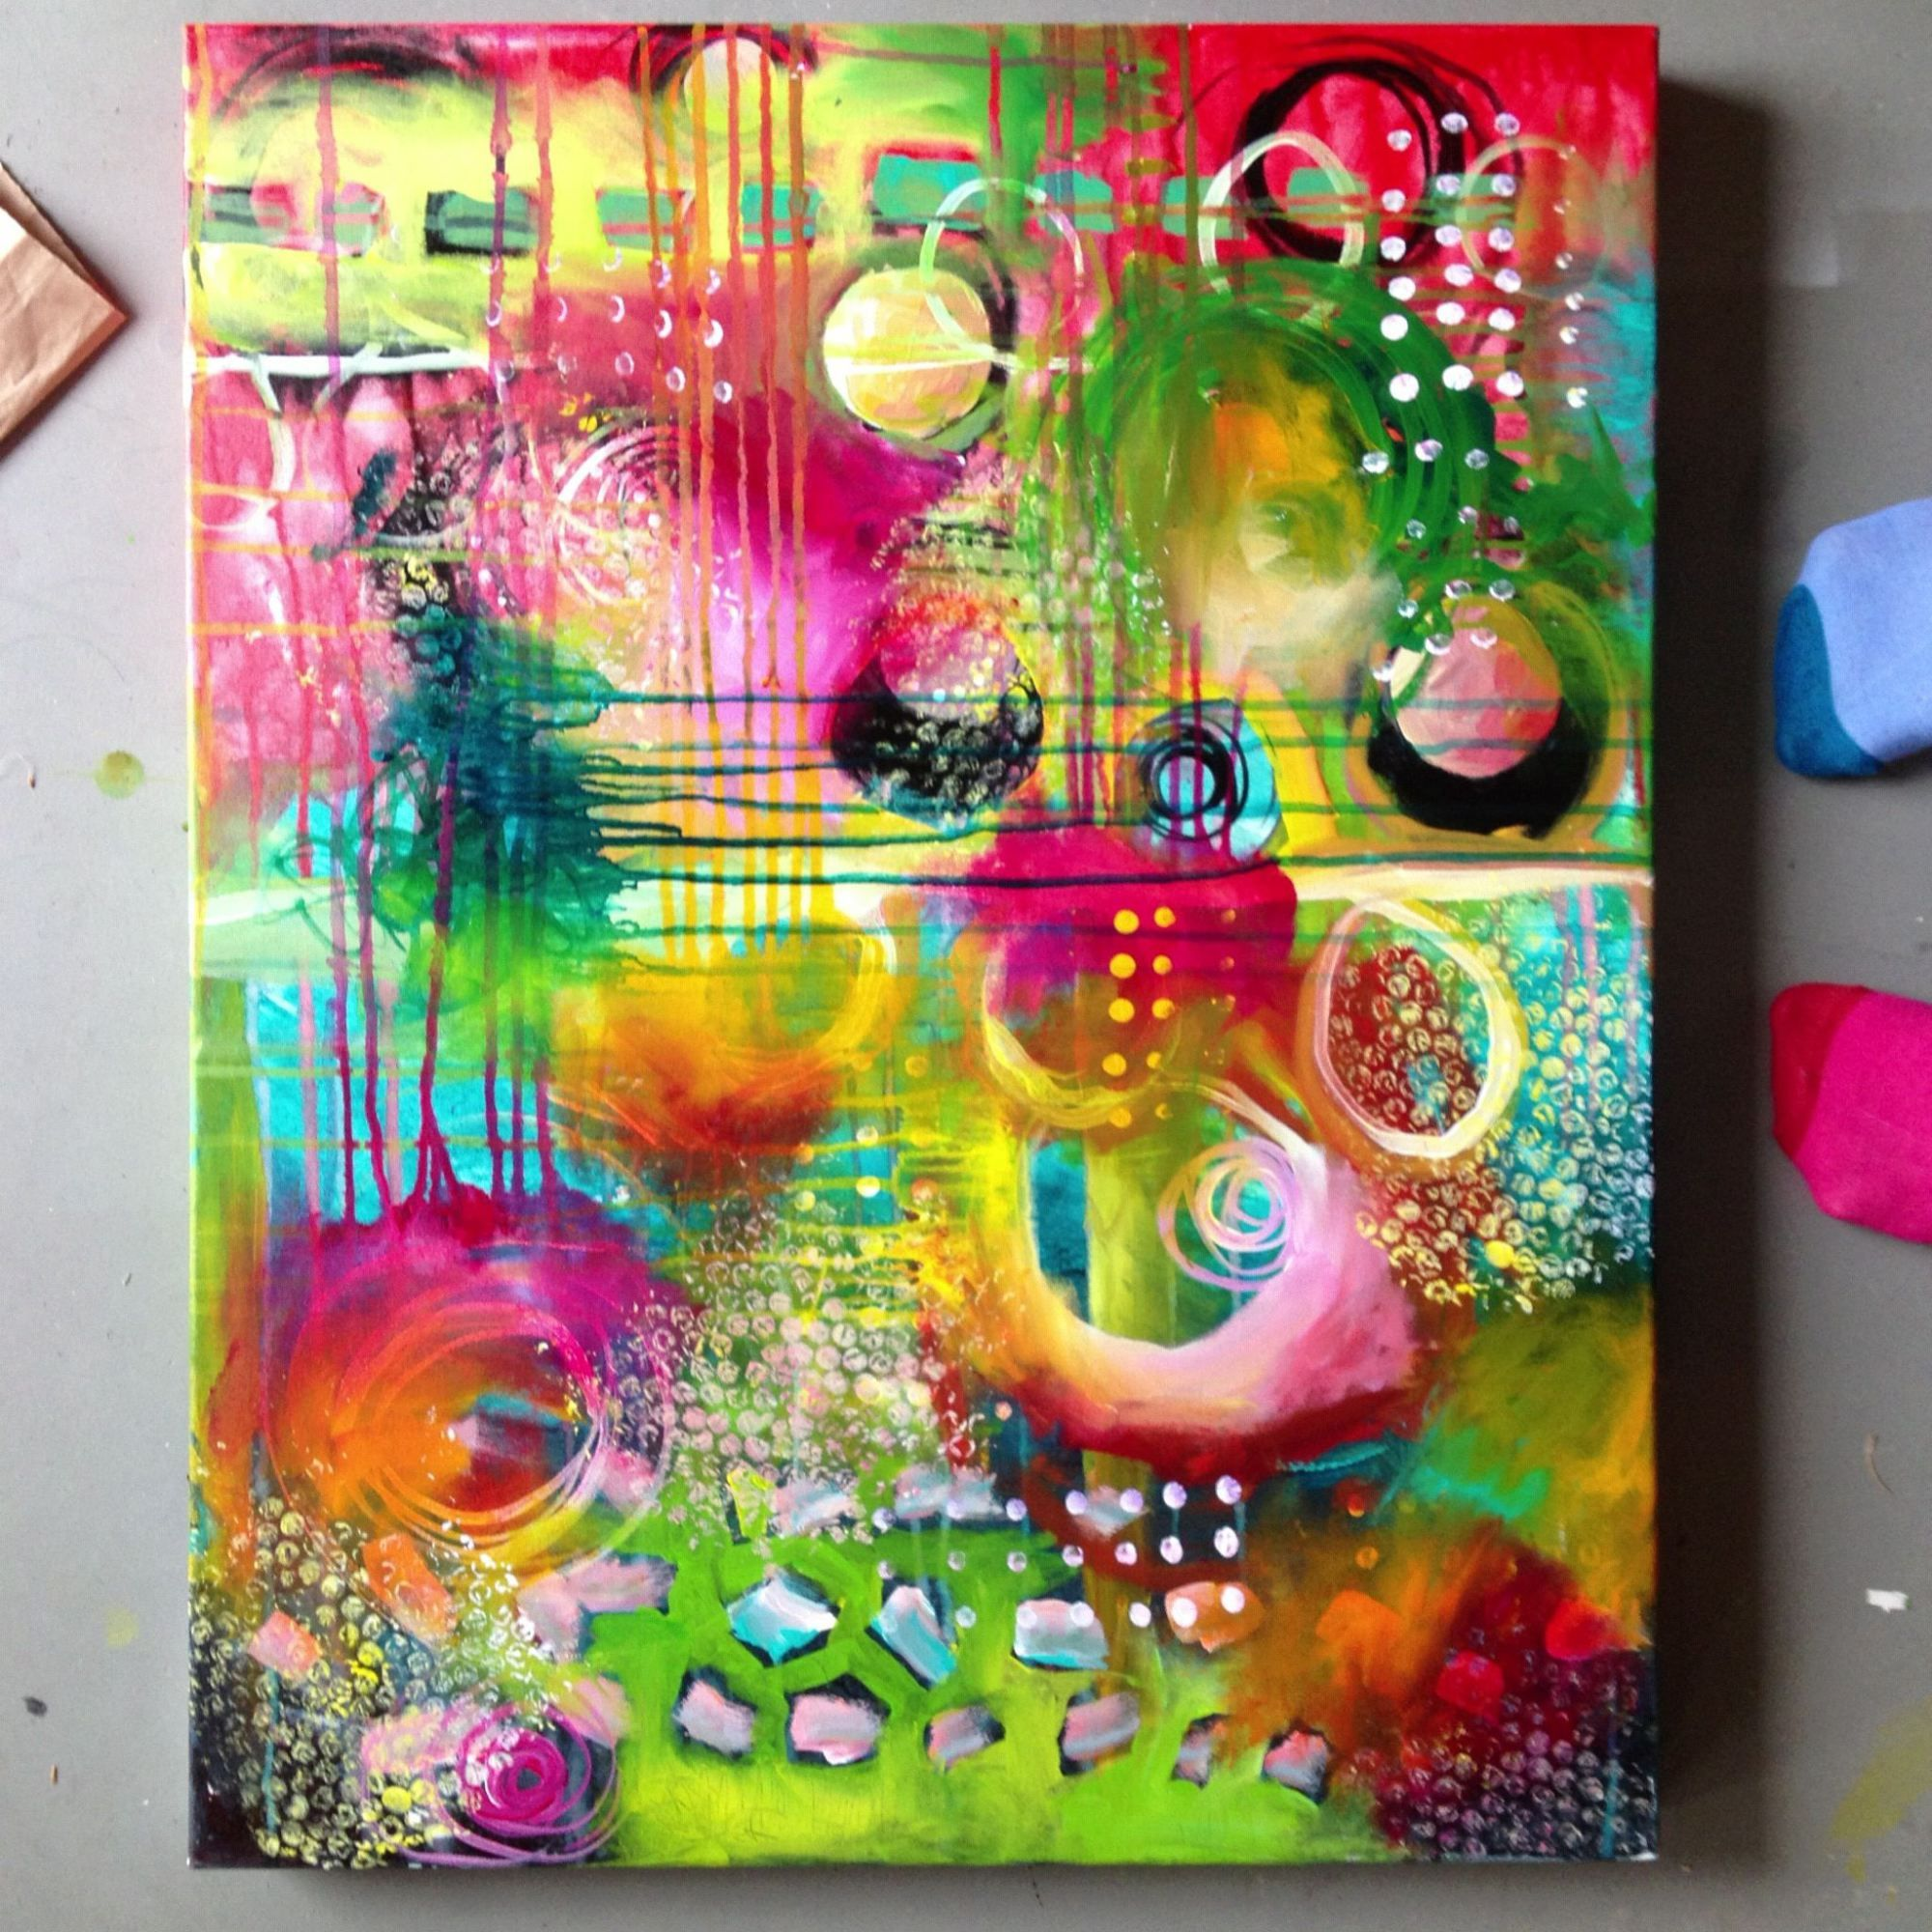 Painting Progression: Commission for K & J #artjournalmixedmediainspiration